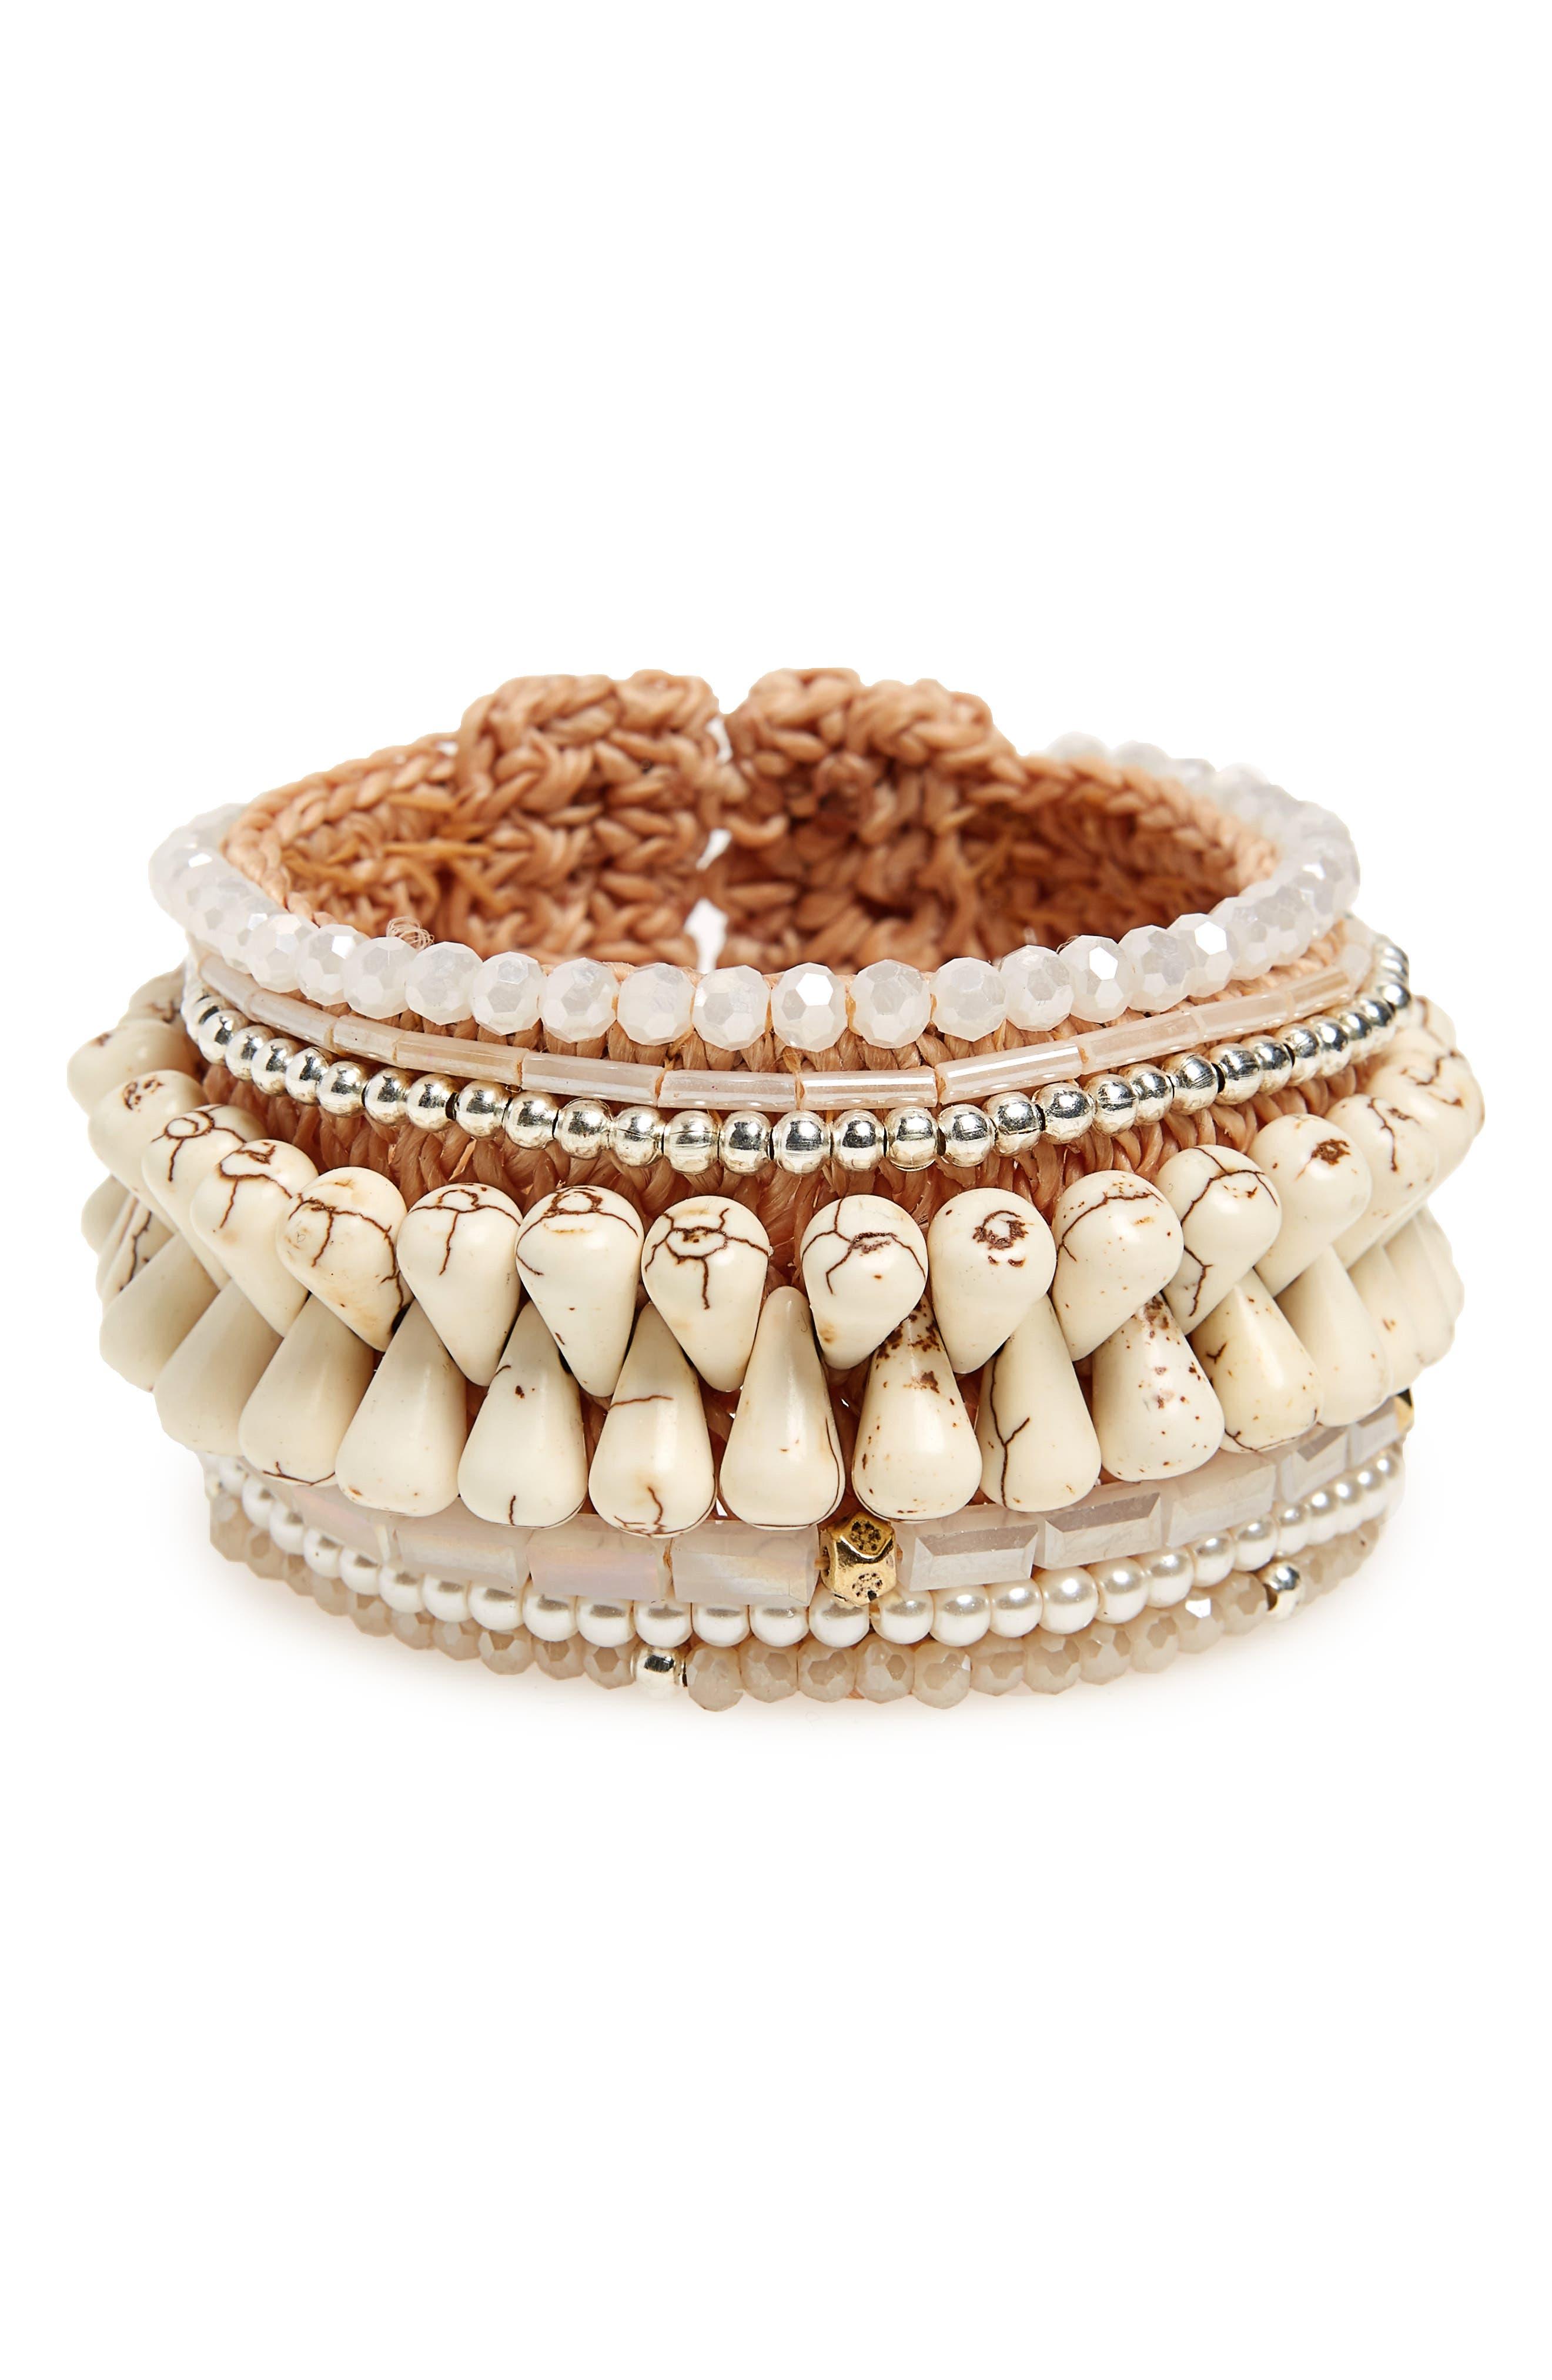 Beaded Rope Cuff Bracelet,                             Main thumbnail 1, color,                             100